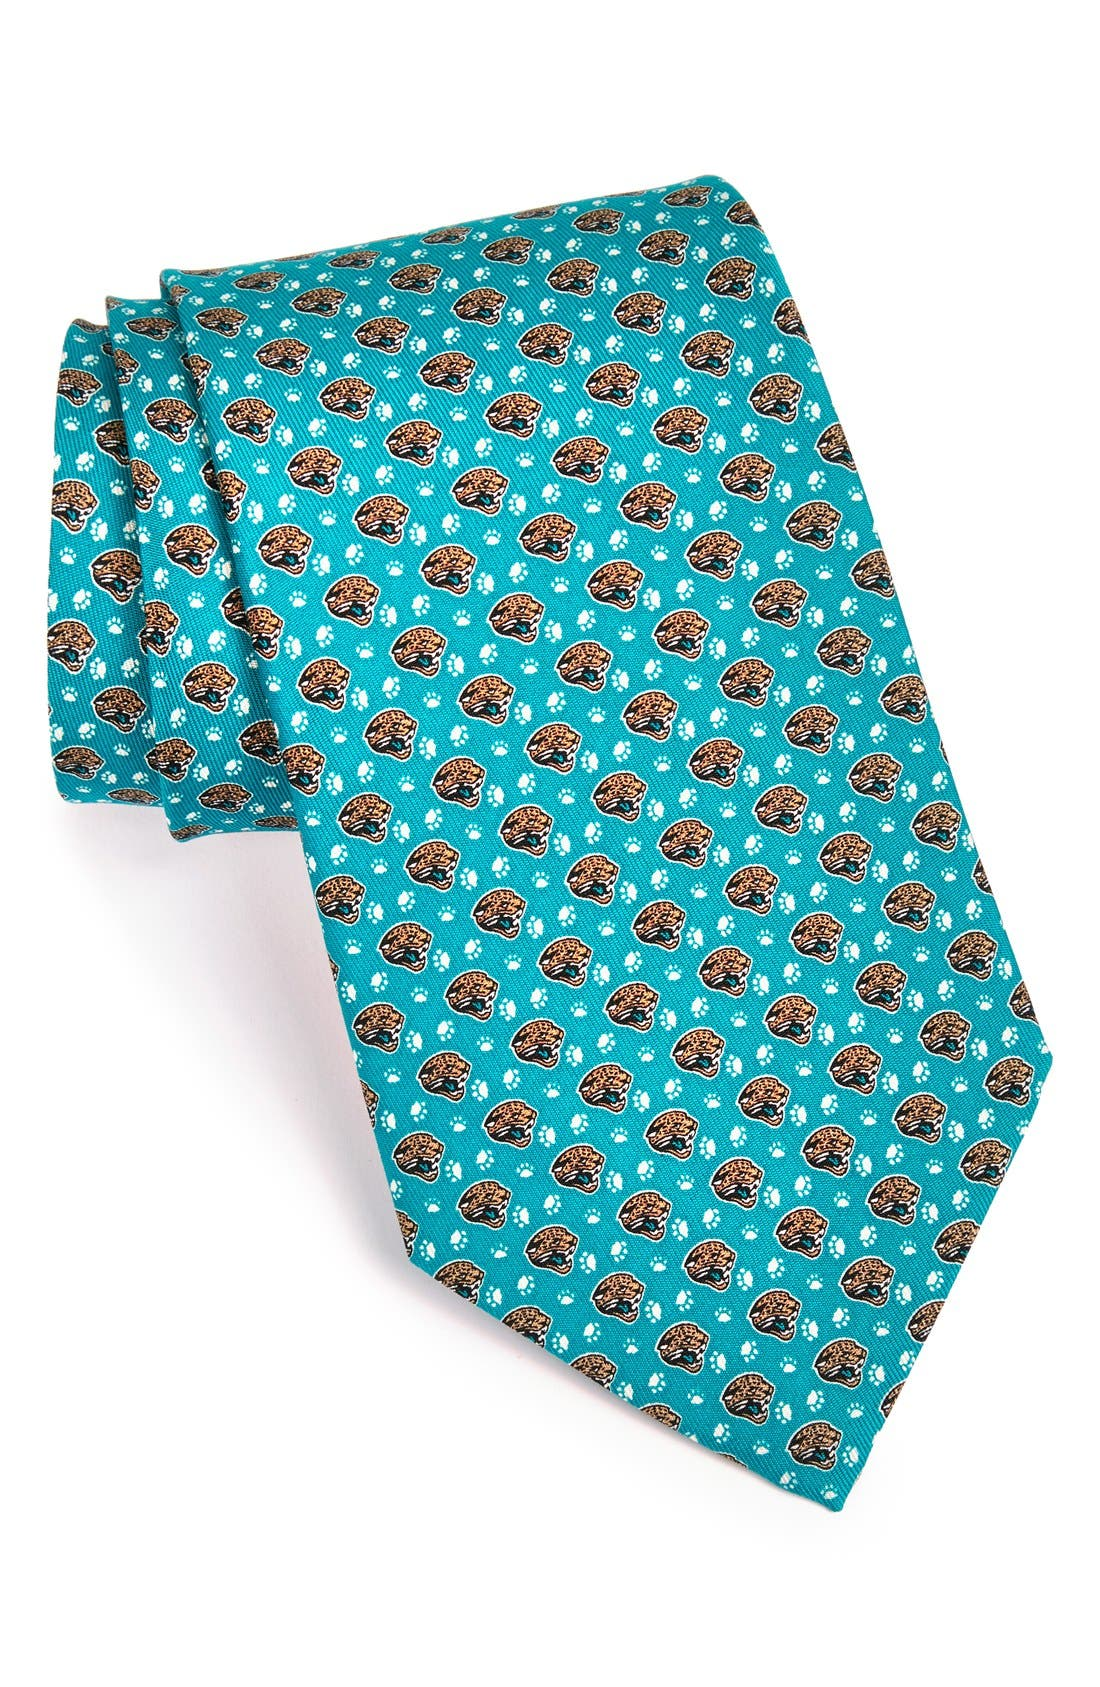 Vineyard Vines 'Jacksonville Jaguars - NFL' Woven Silk Tie